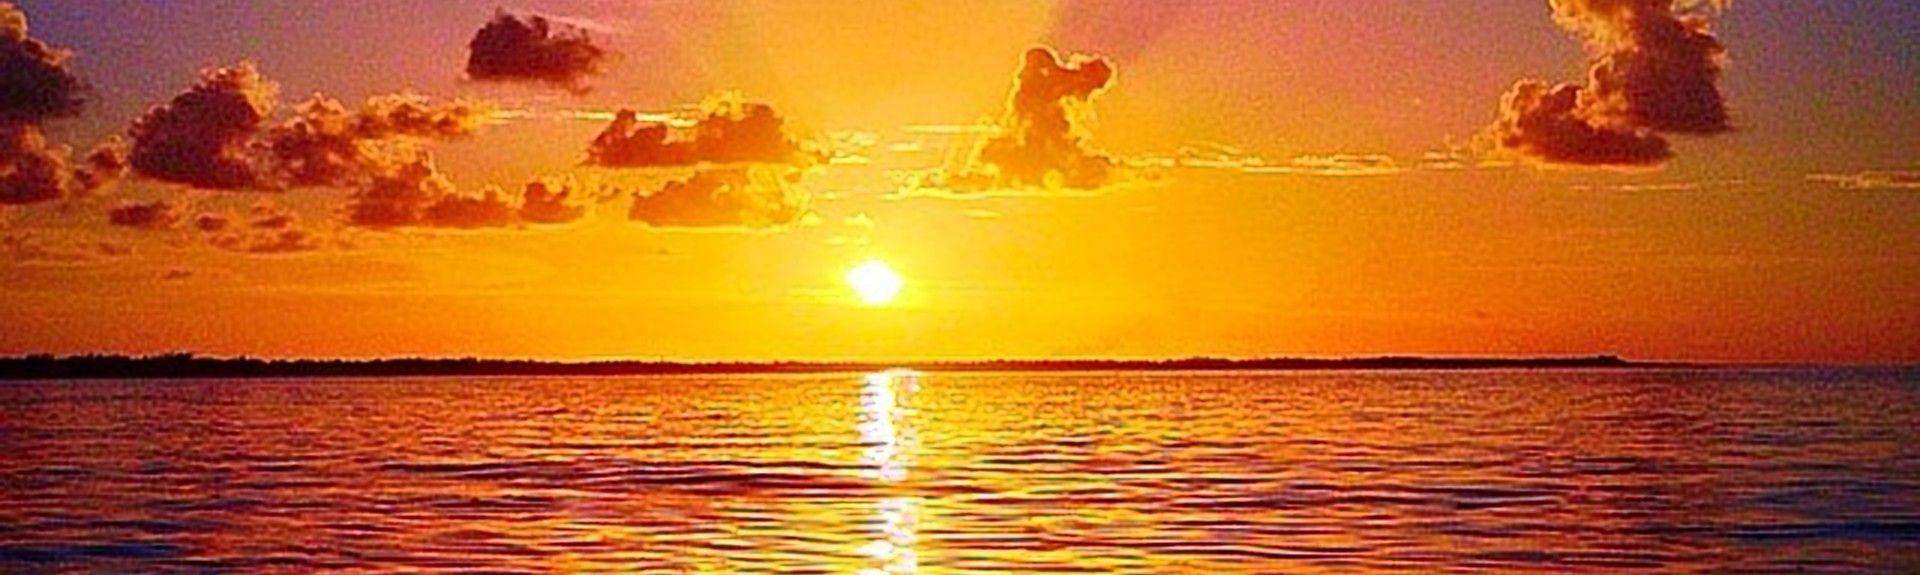 North Abaco, The Bahamas